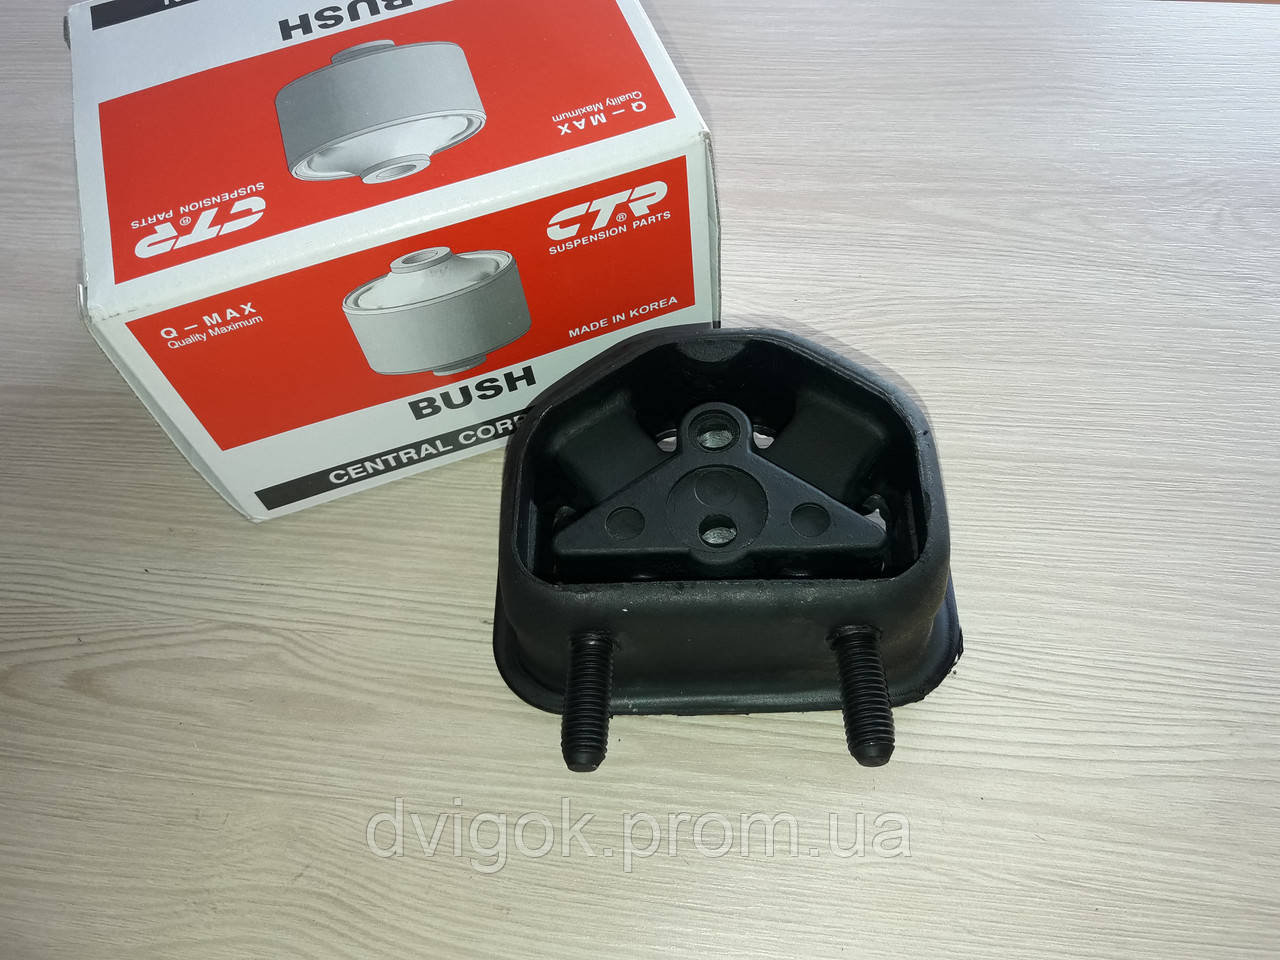 Опора двигателя правая CTR для Daewoo Lanos ЗАЗ Ланос ЗАЗ Сенс  902503